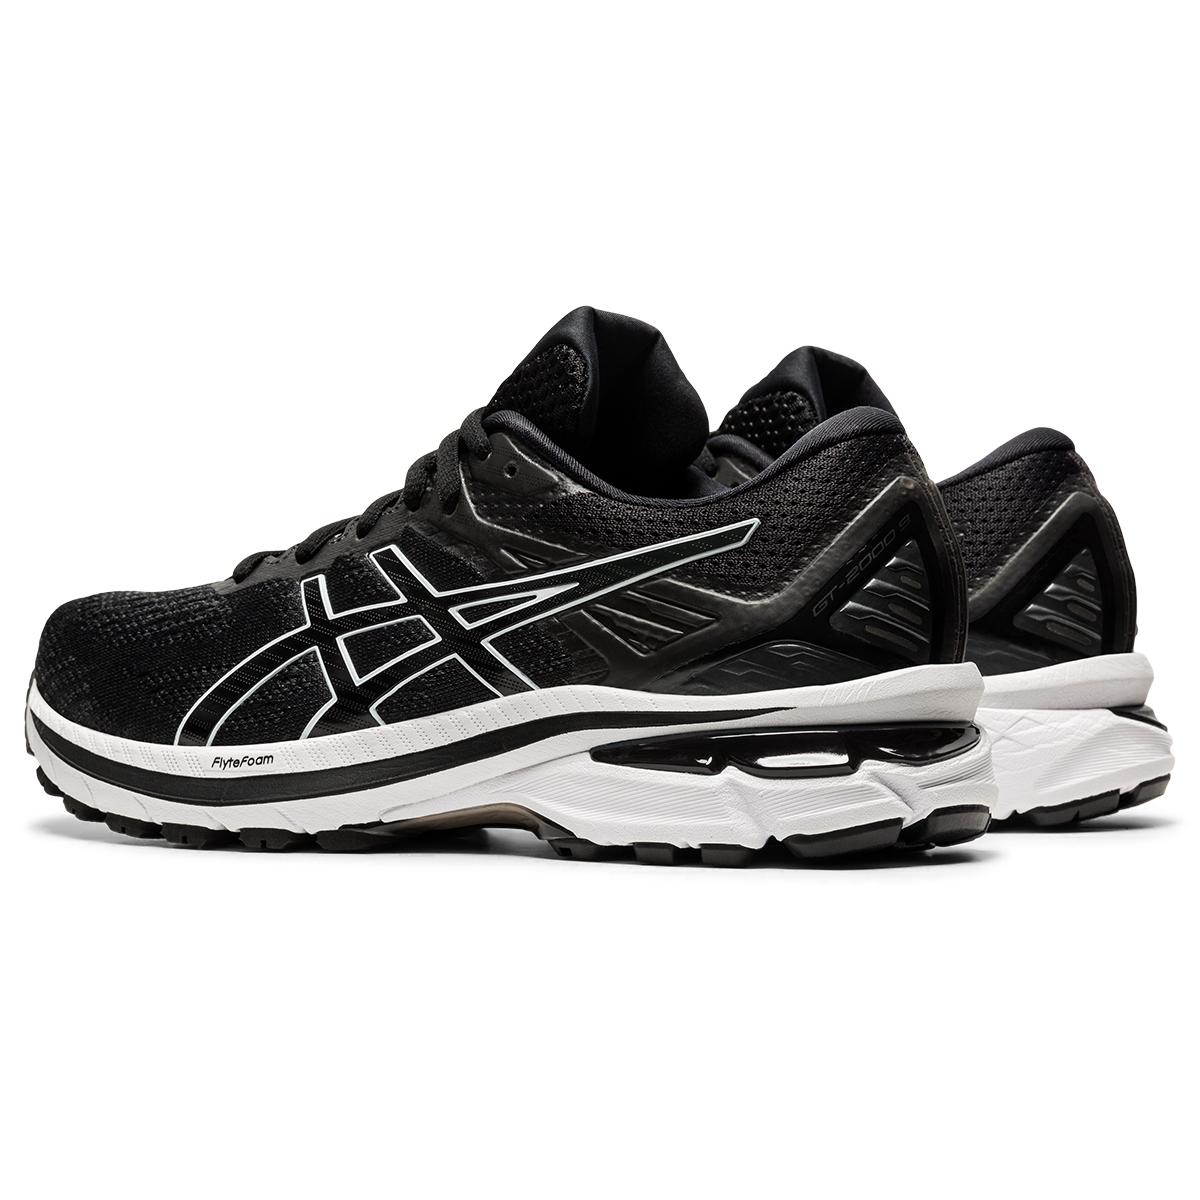 Women's Asics Gt-2000 9 Running Shoe - Color: Black/White - Size: 5 - Width: Regular, Black/White, large, image 4